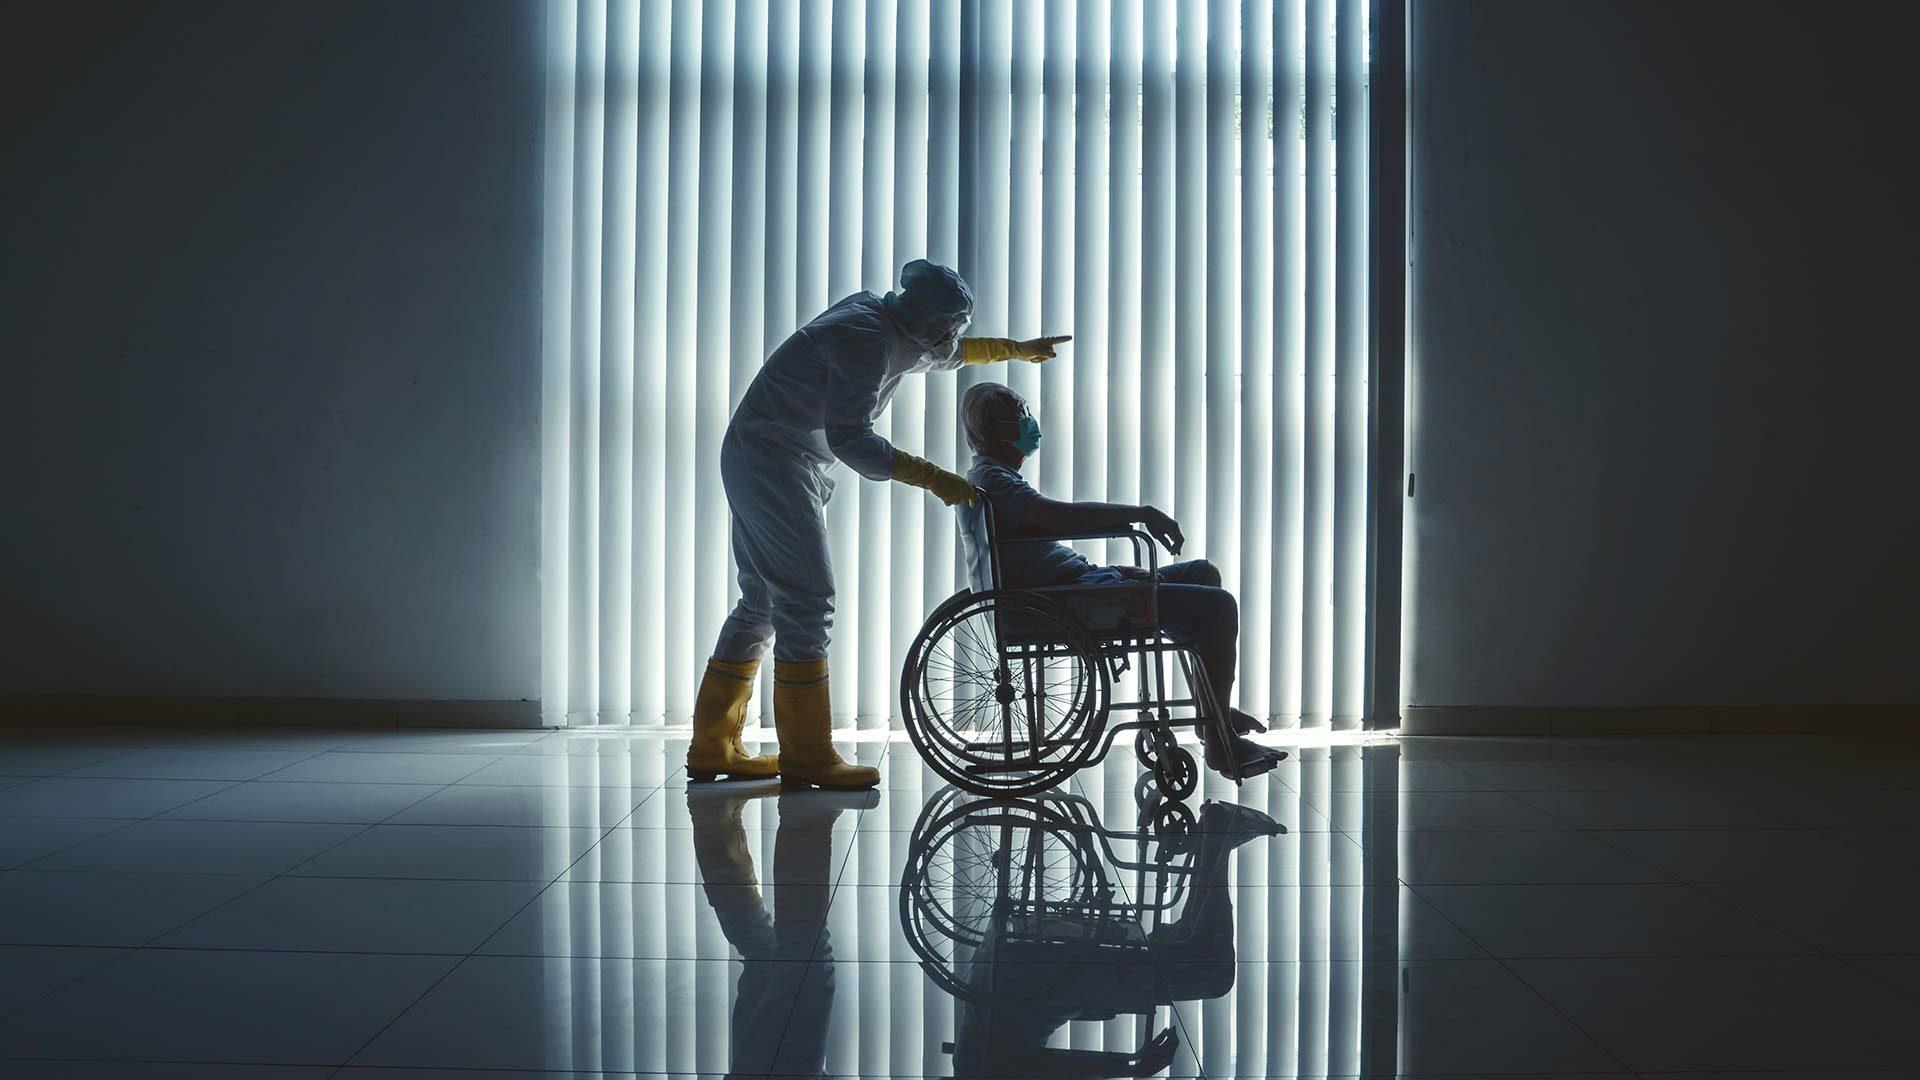 Covid-patiënten uit woonzorgcentra